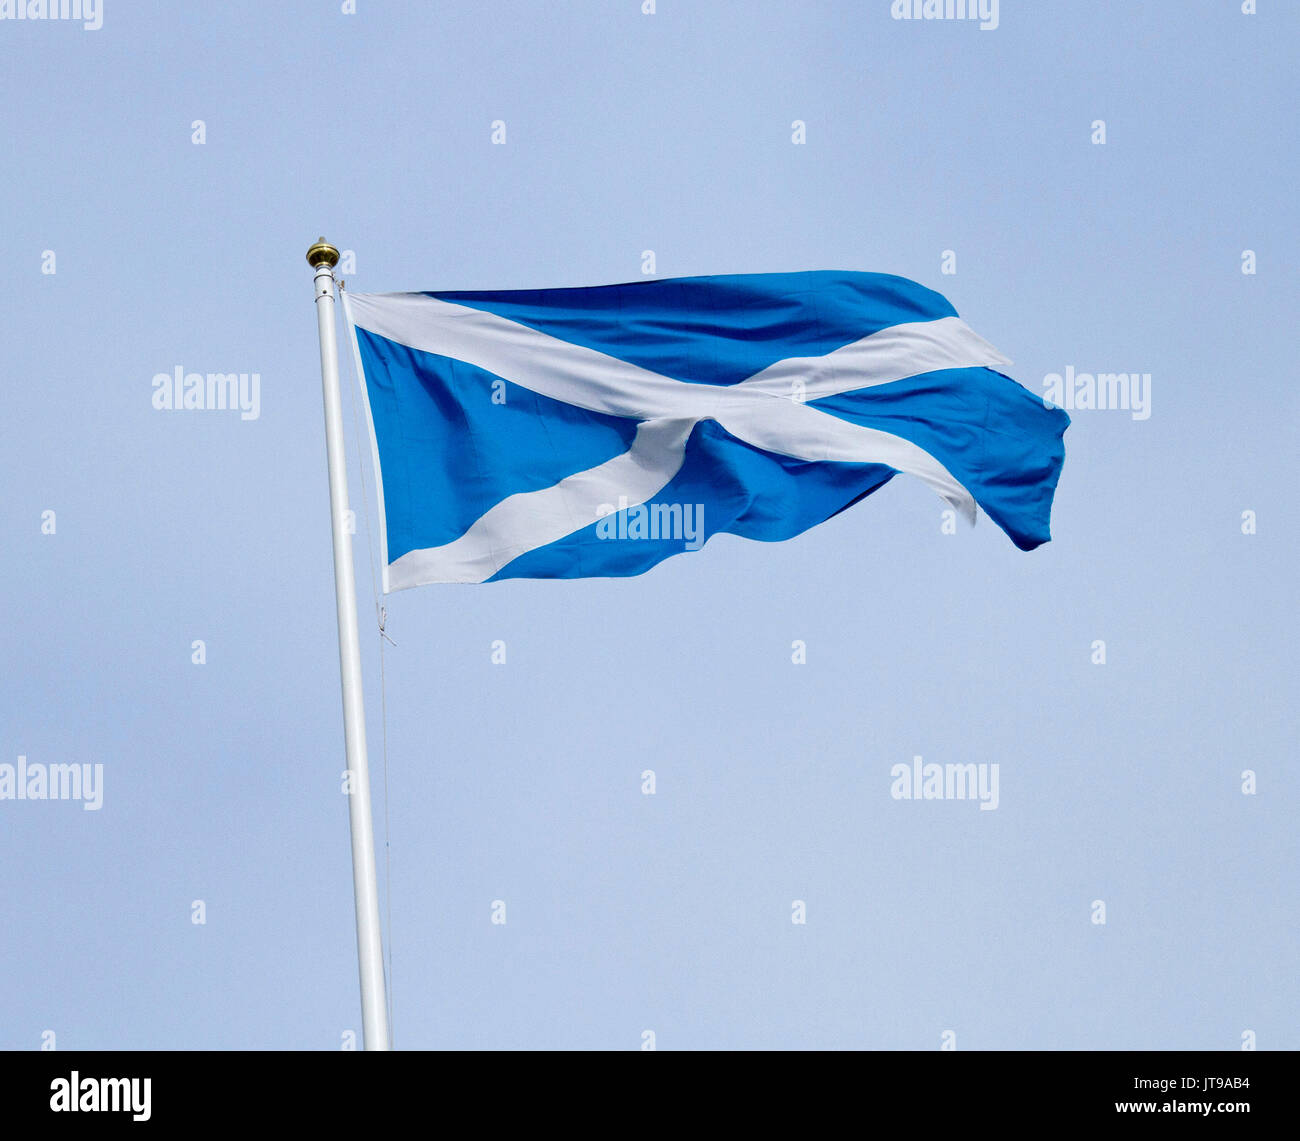 scotland flag and pole stock photos u0026 scotland flag and pole stock